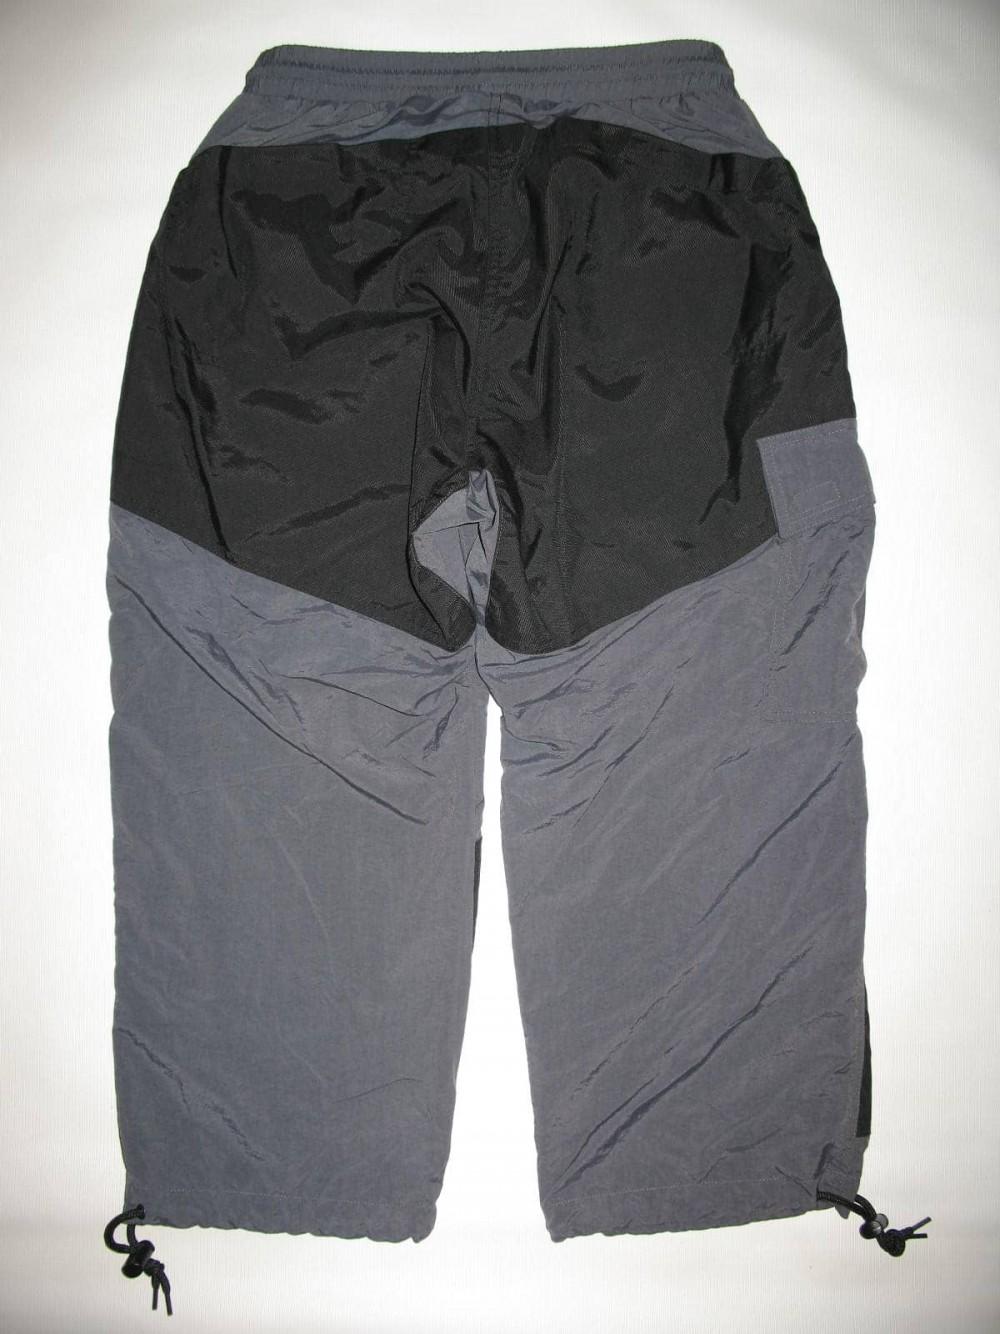 Шорты JACK WOLFSKIN 3/4 pants unisex (размер М) - 1